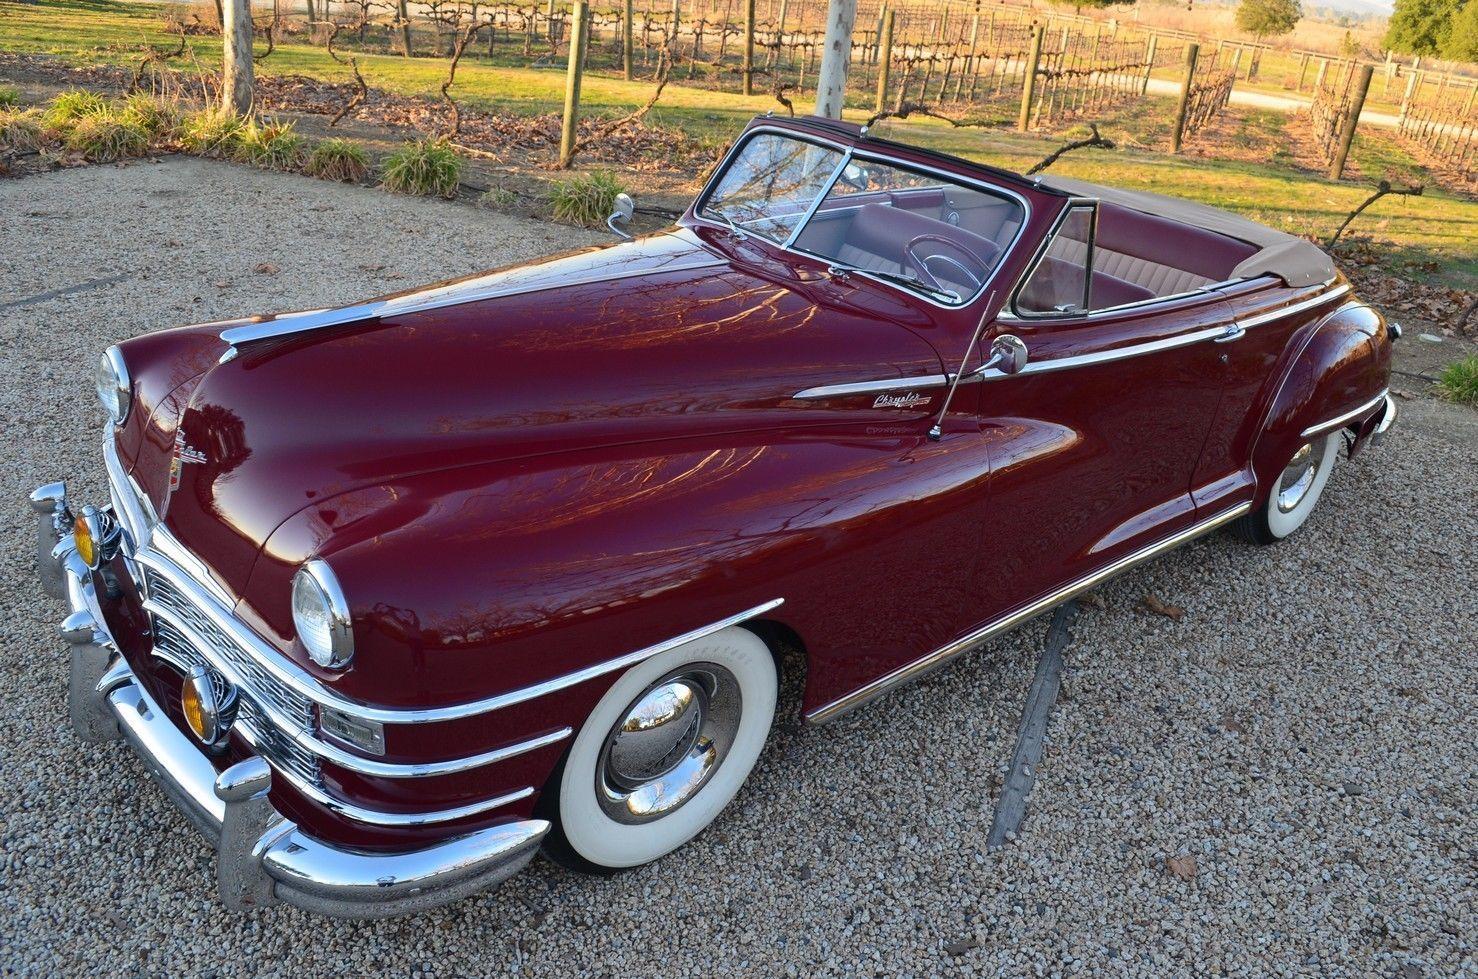 48 Chrysler New Yorker Visits Http Www Northlanddodge Ca For